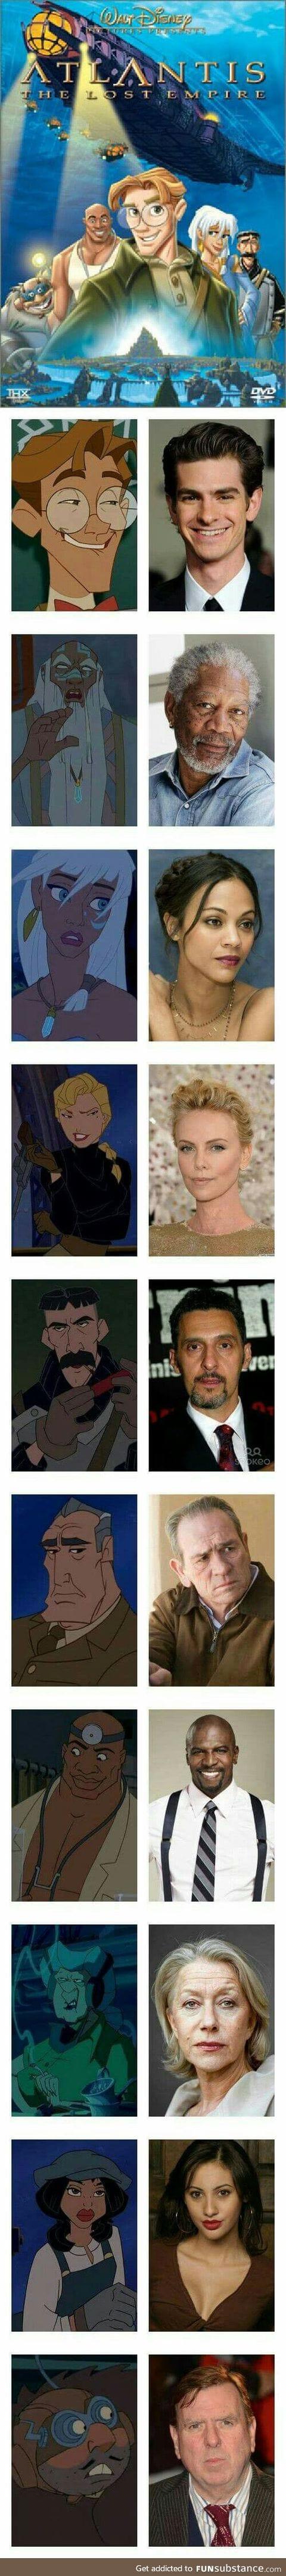 Real life Atlantis movie cast!